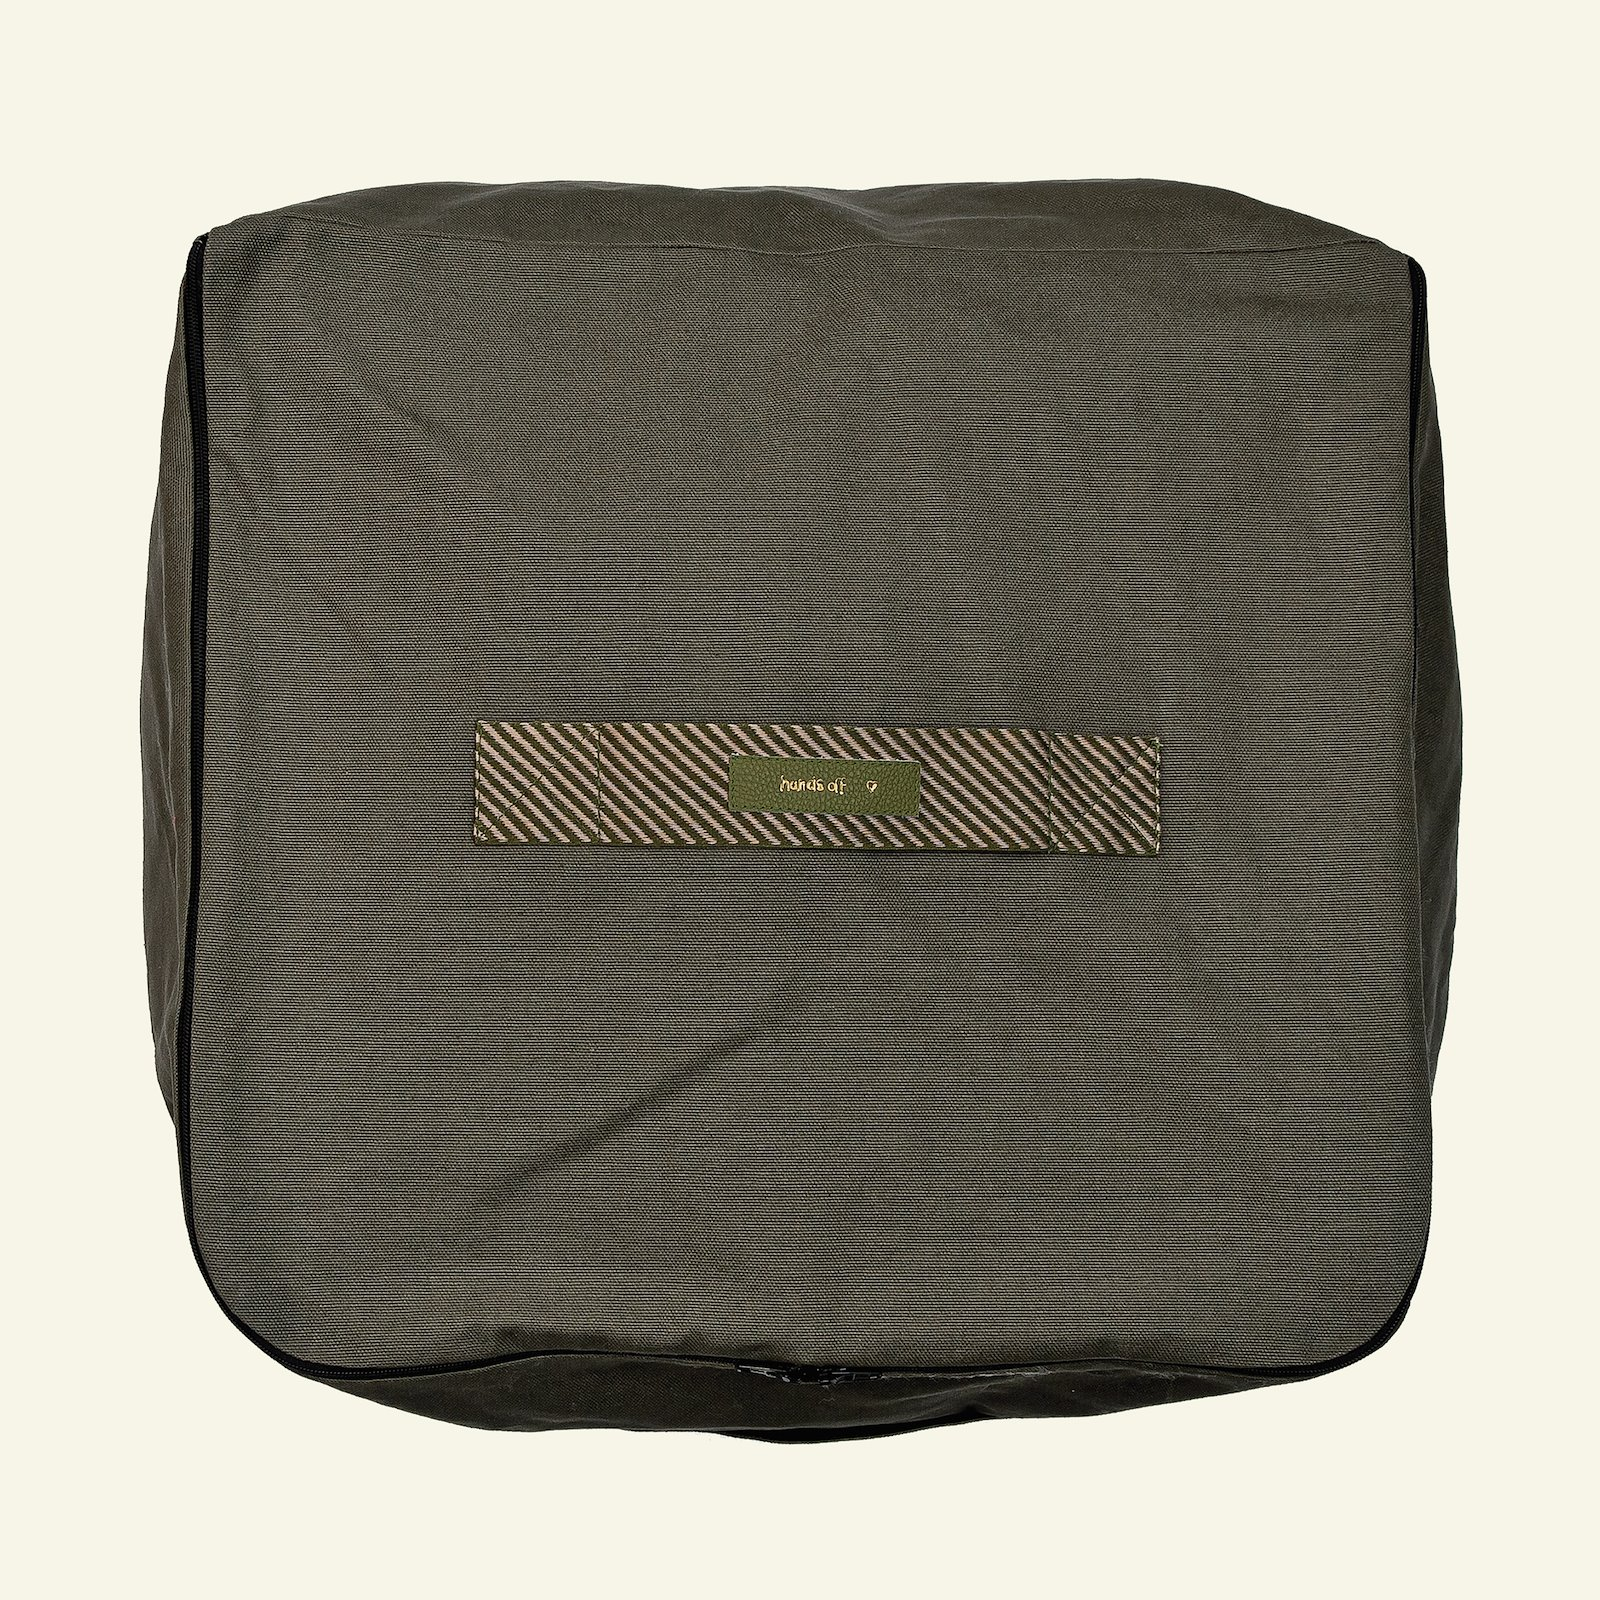 Cotton canvas army green p90327_780403_21449_26481_sskit